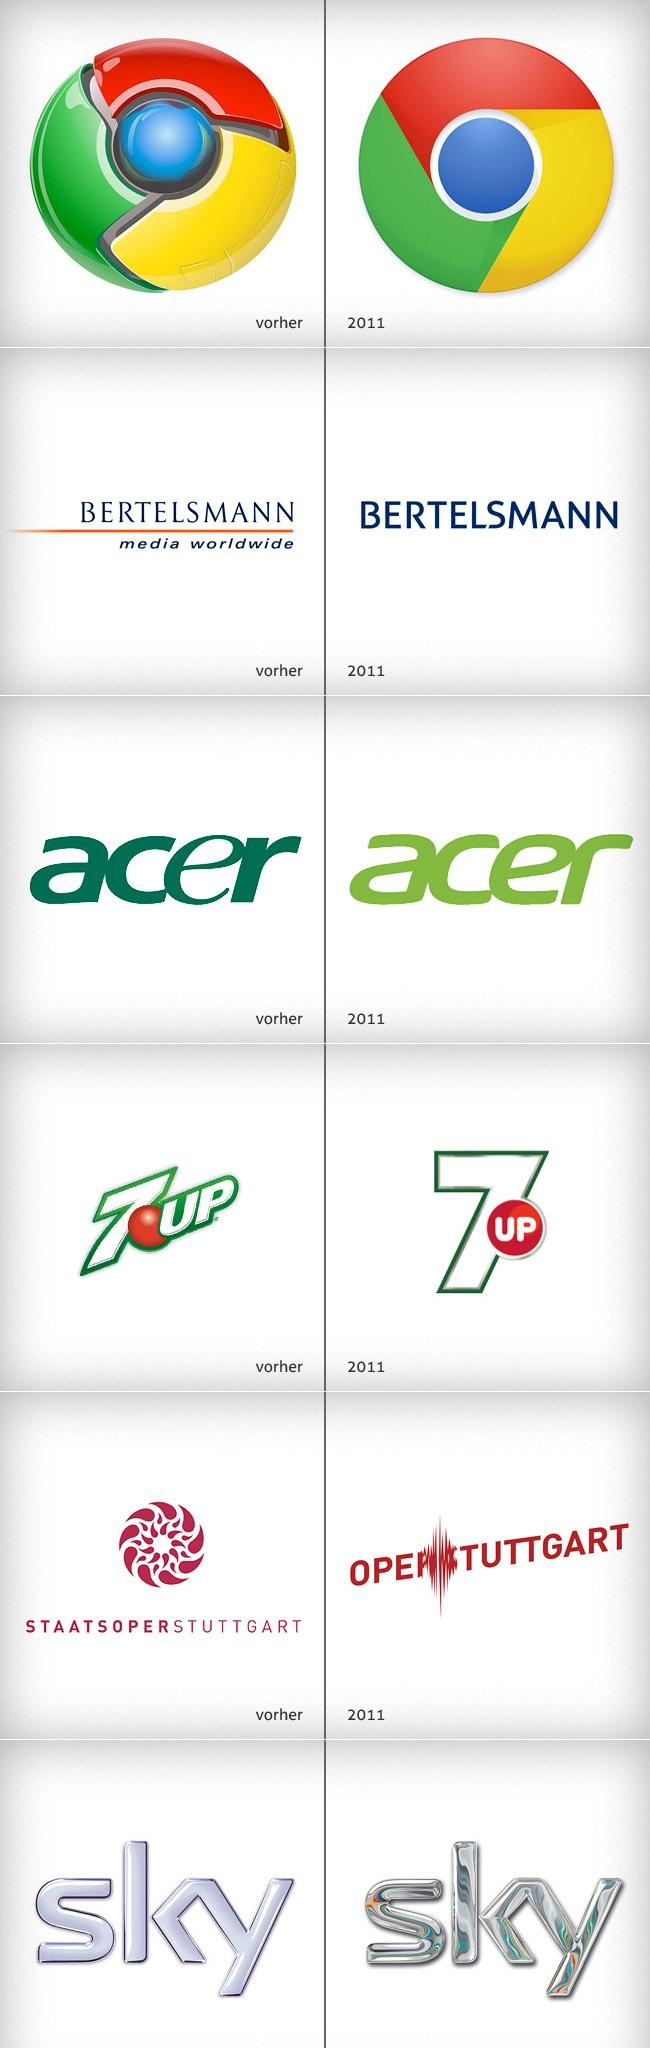 grafiker.de - Die Logo-Redesigns 2011